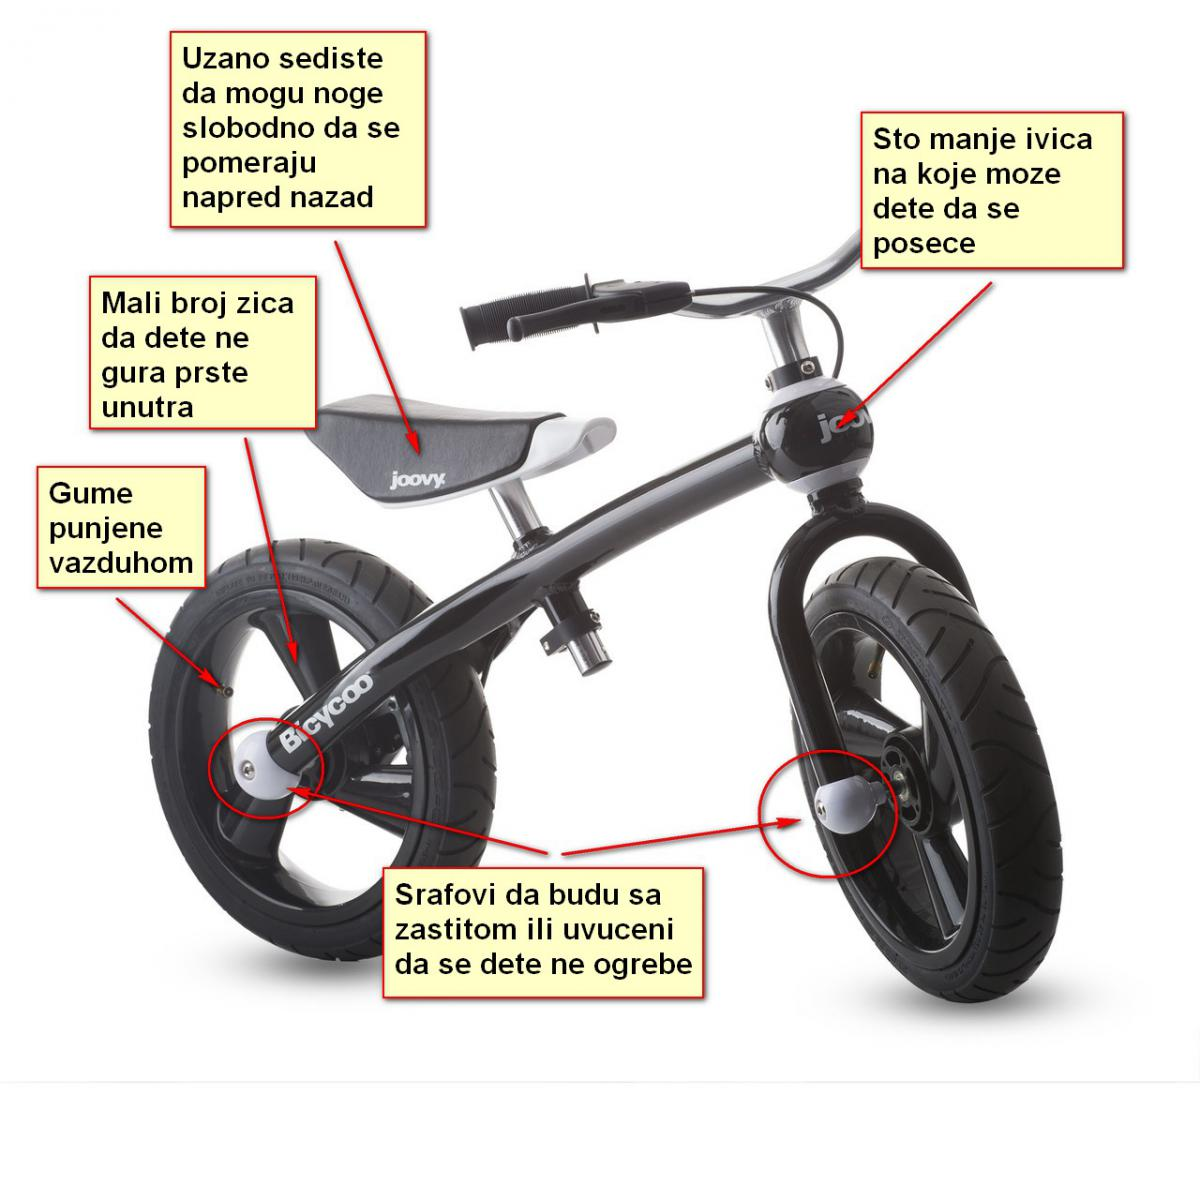 Naučite dete da vozi koristeći balans bicikl - Trening